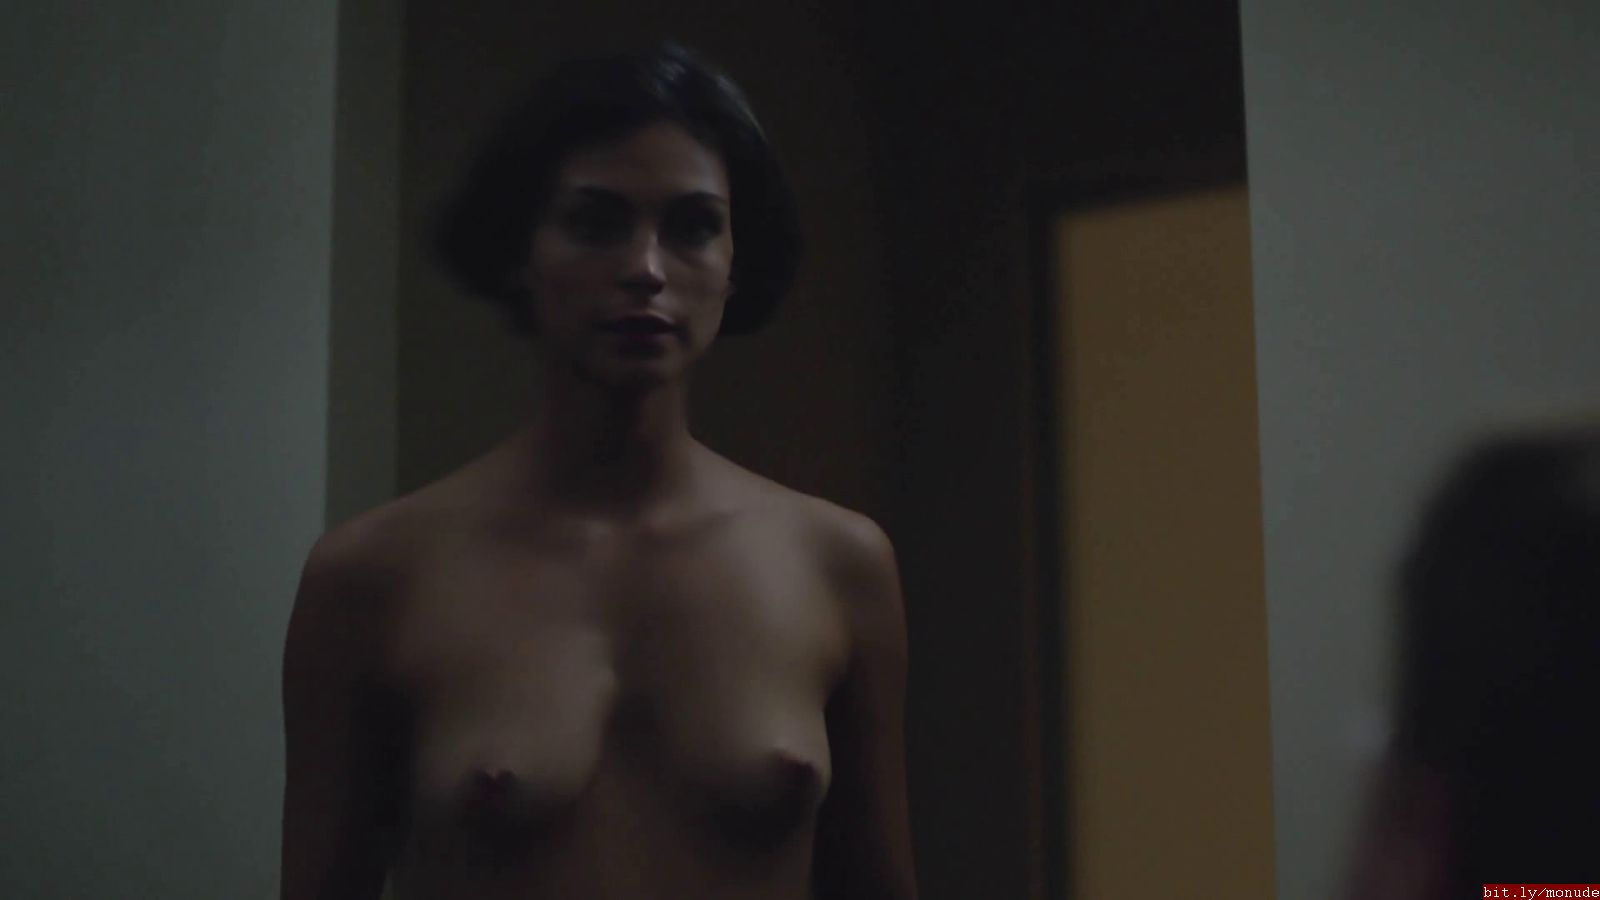 Sex nude morena baccarin